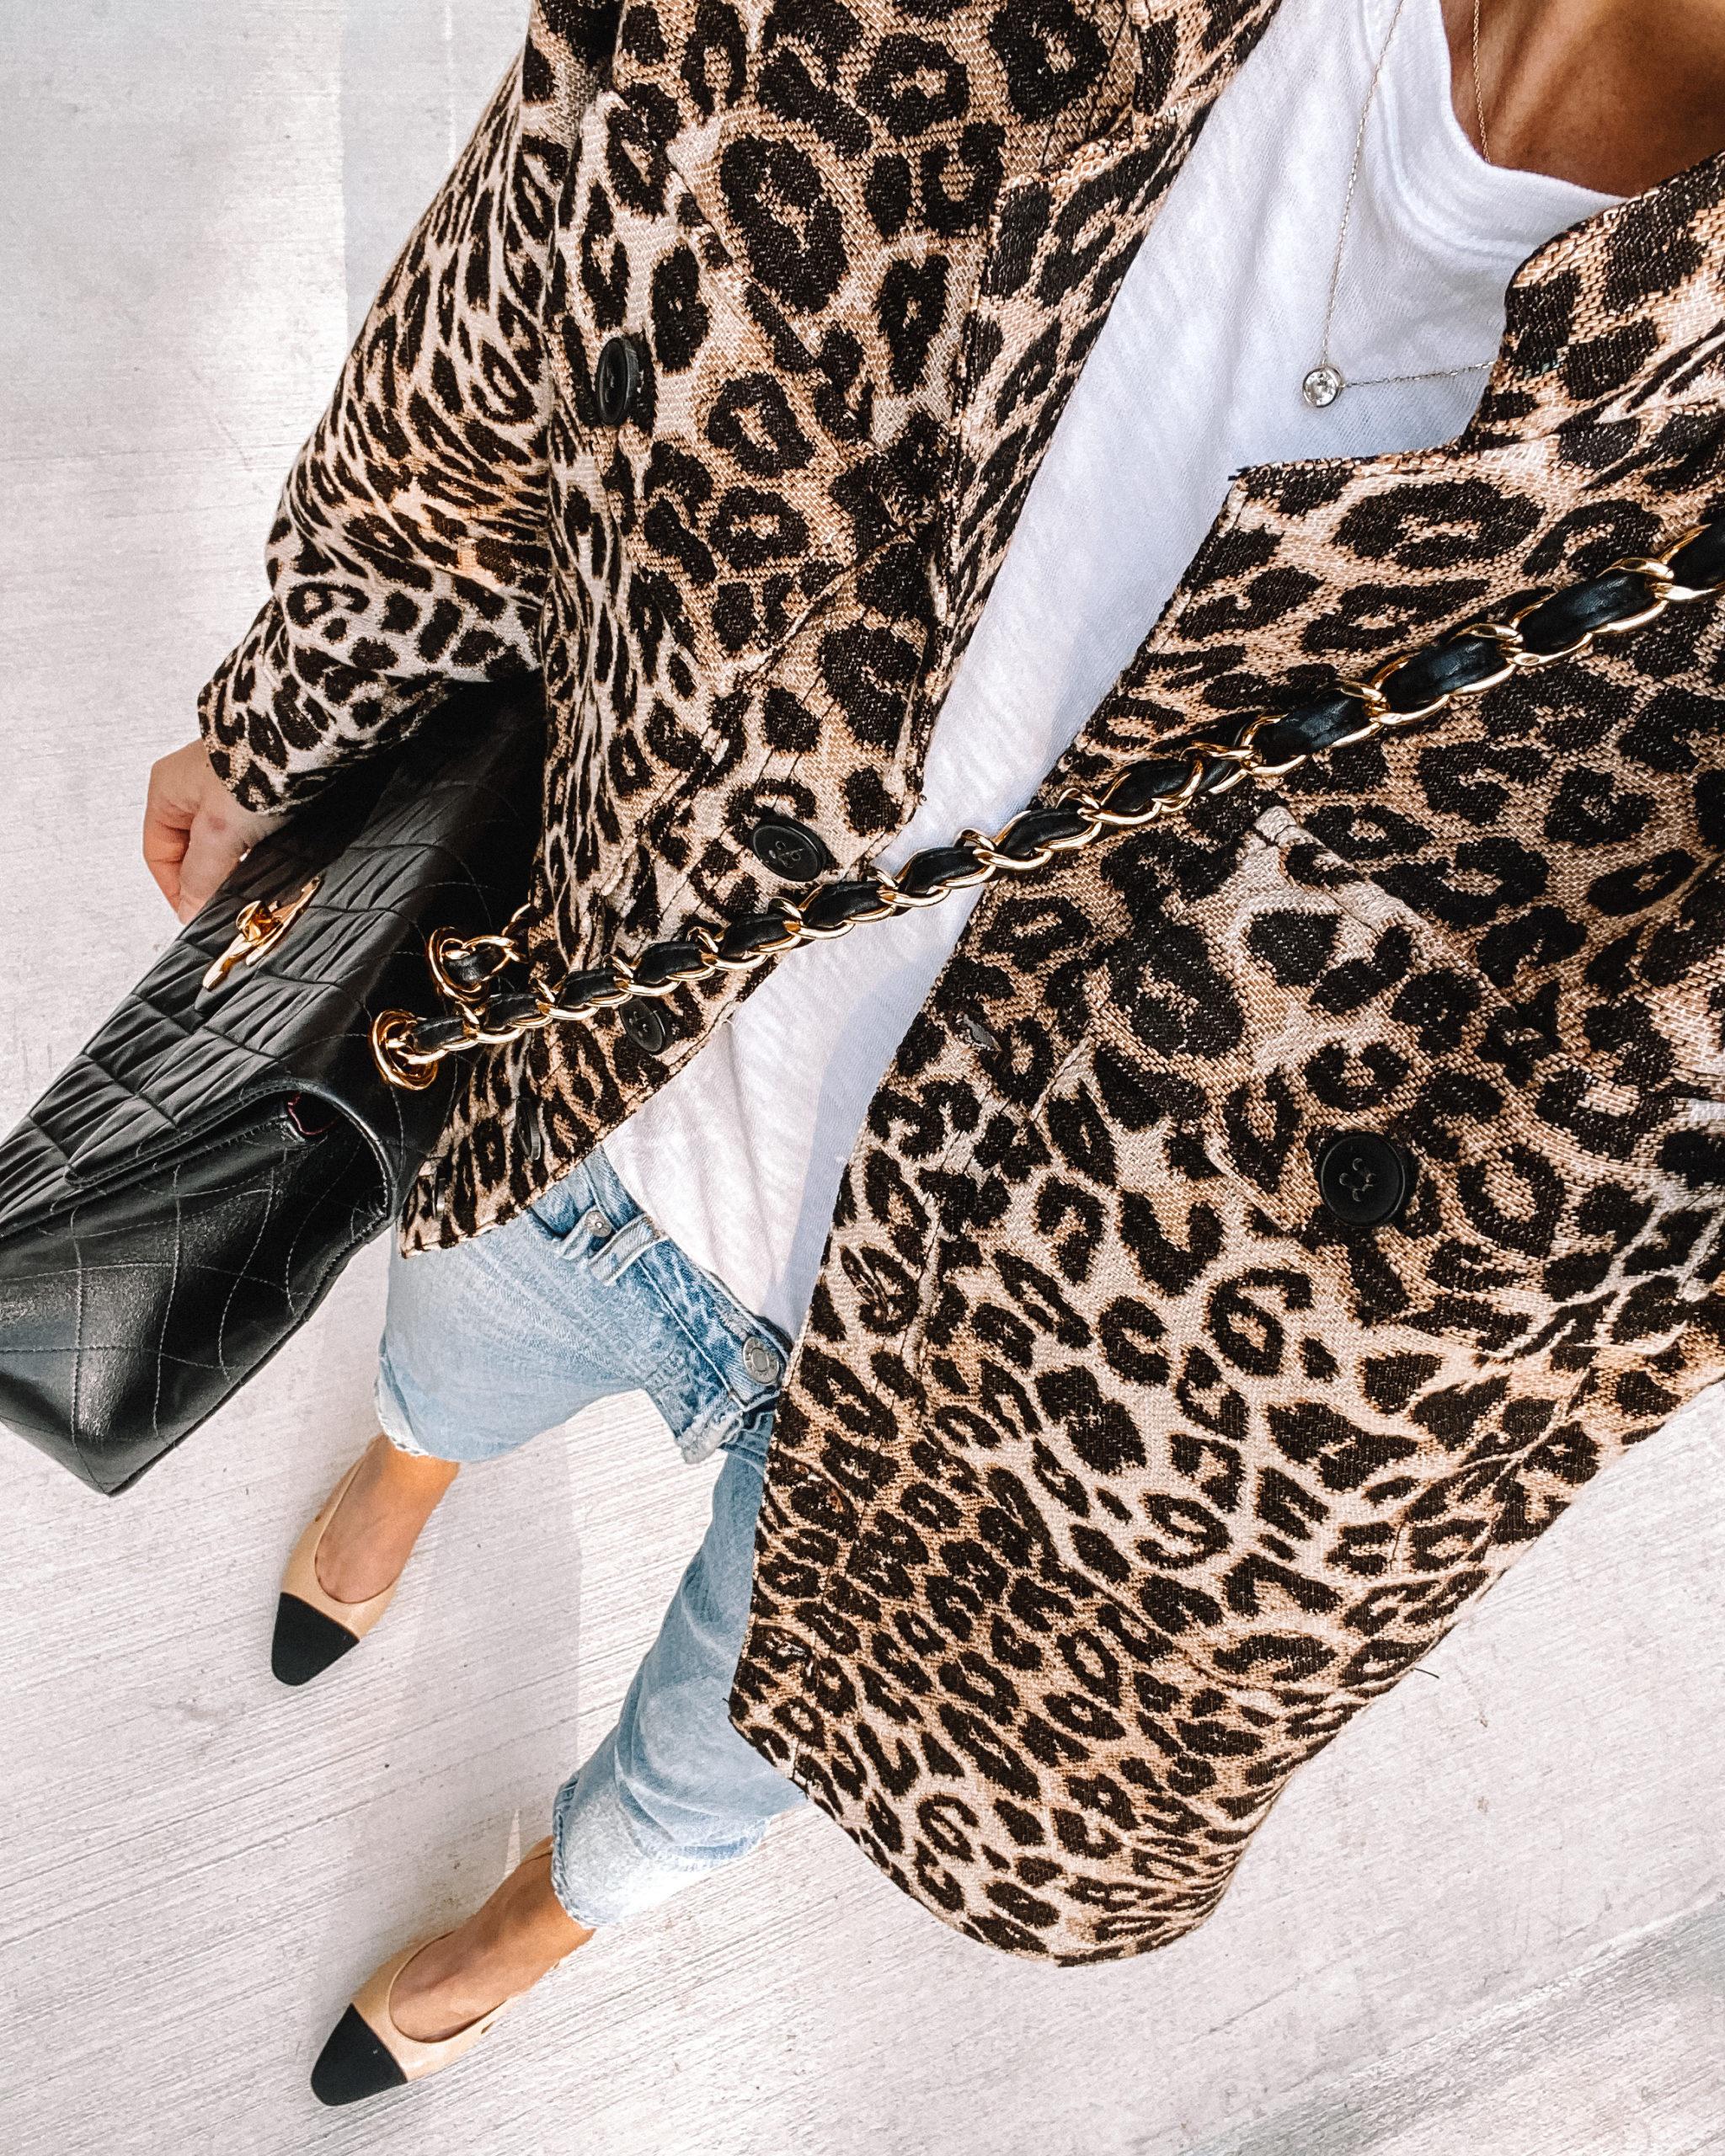 fashion jackson wearing anine bing leopard shacket